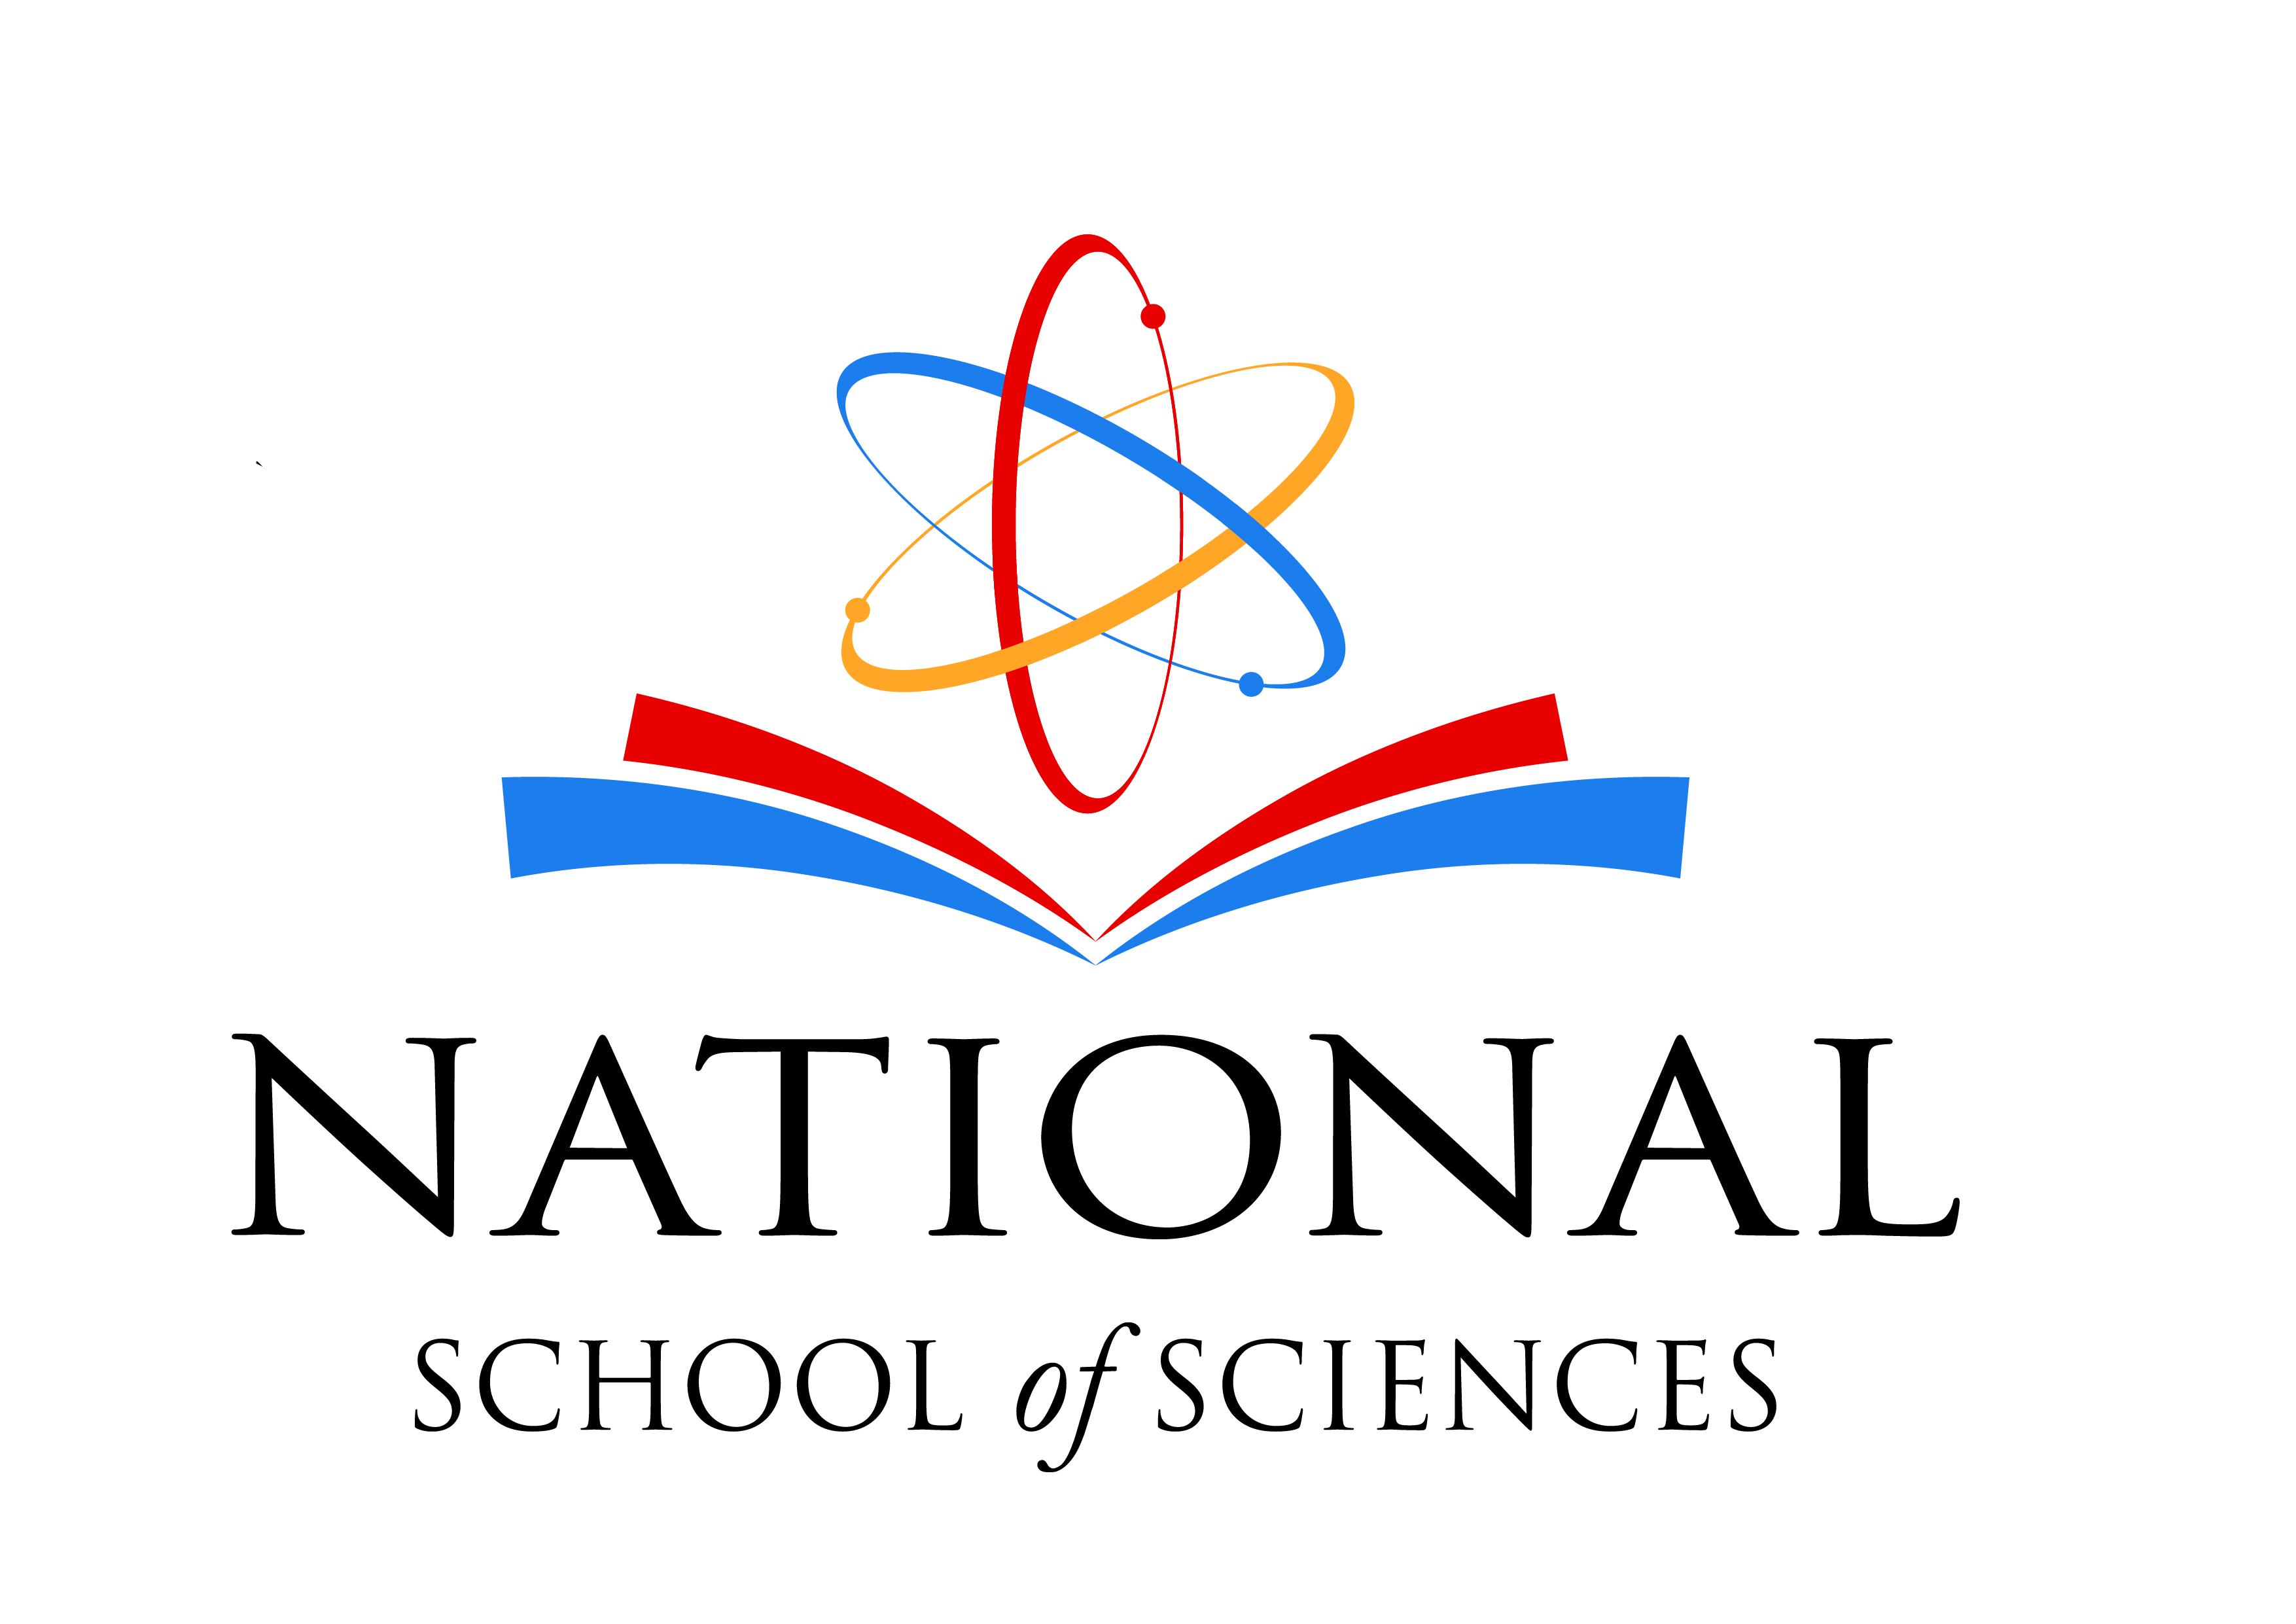 National School of Sciences logo